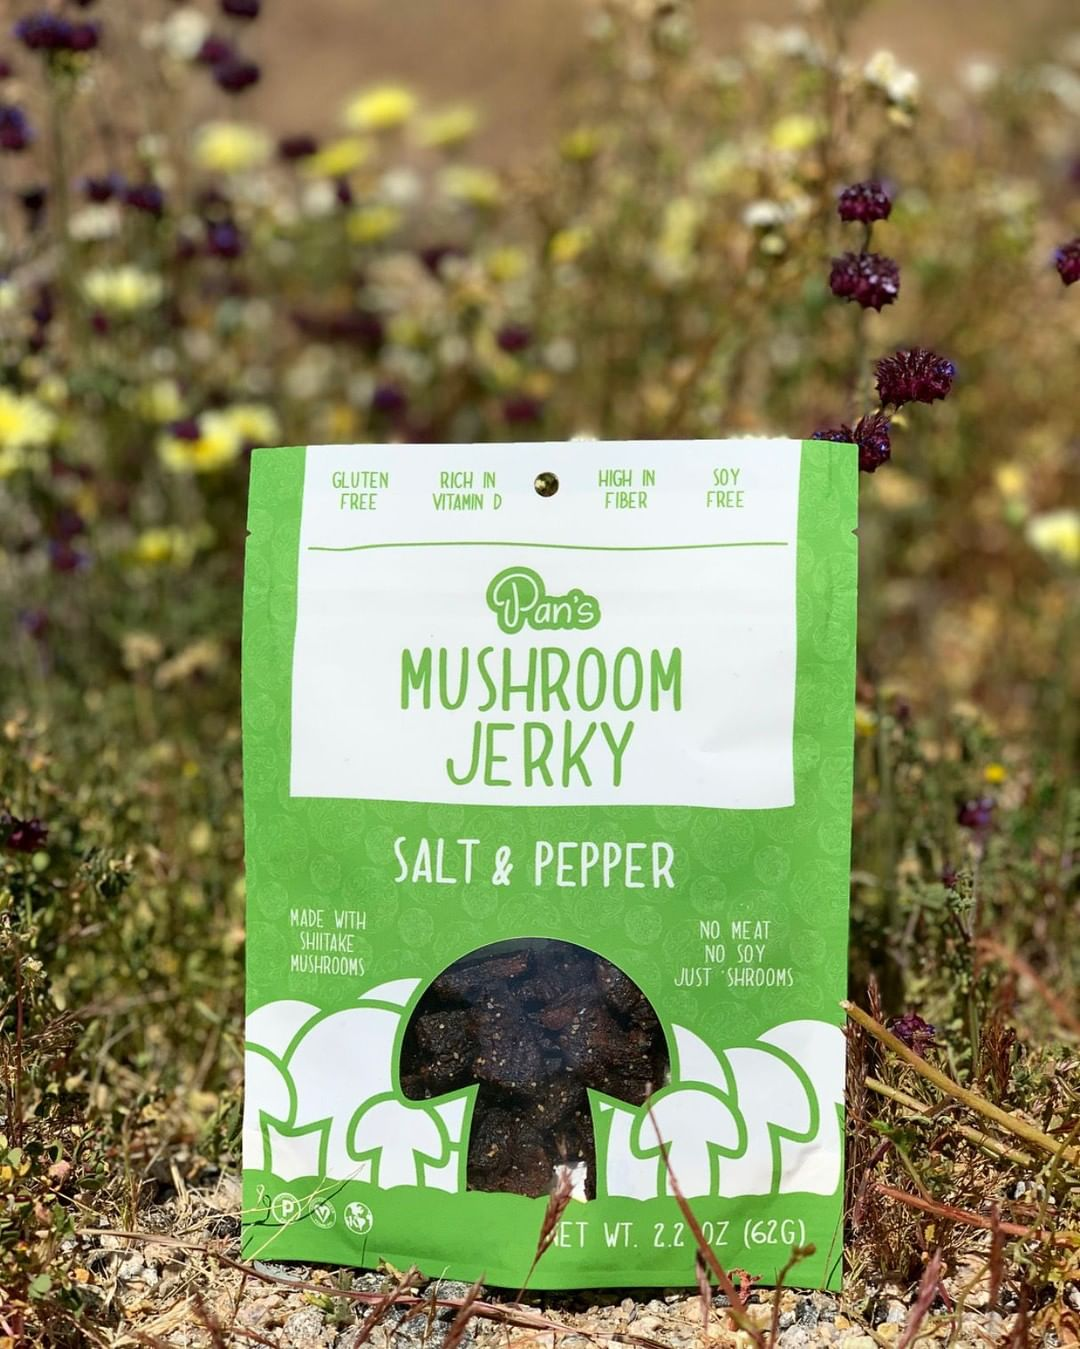 Salt and Pepper Mushroom Jerky by Pan's Stuffed